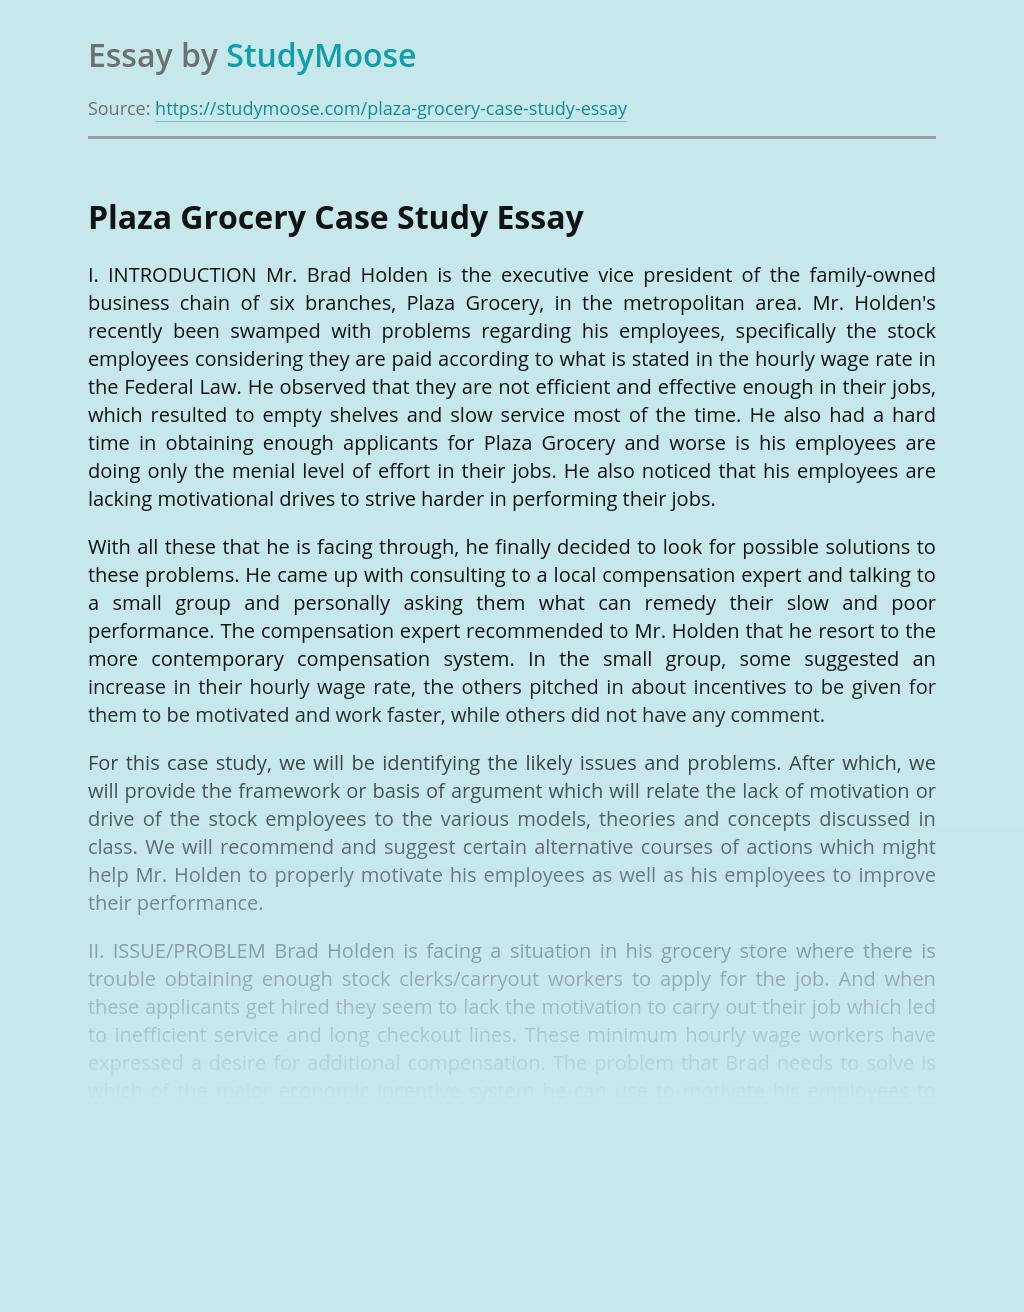 Plaza Grocery Case Study